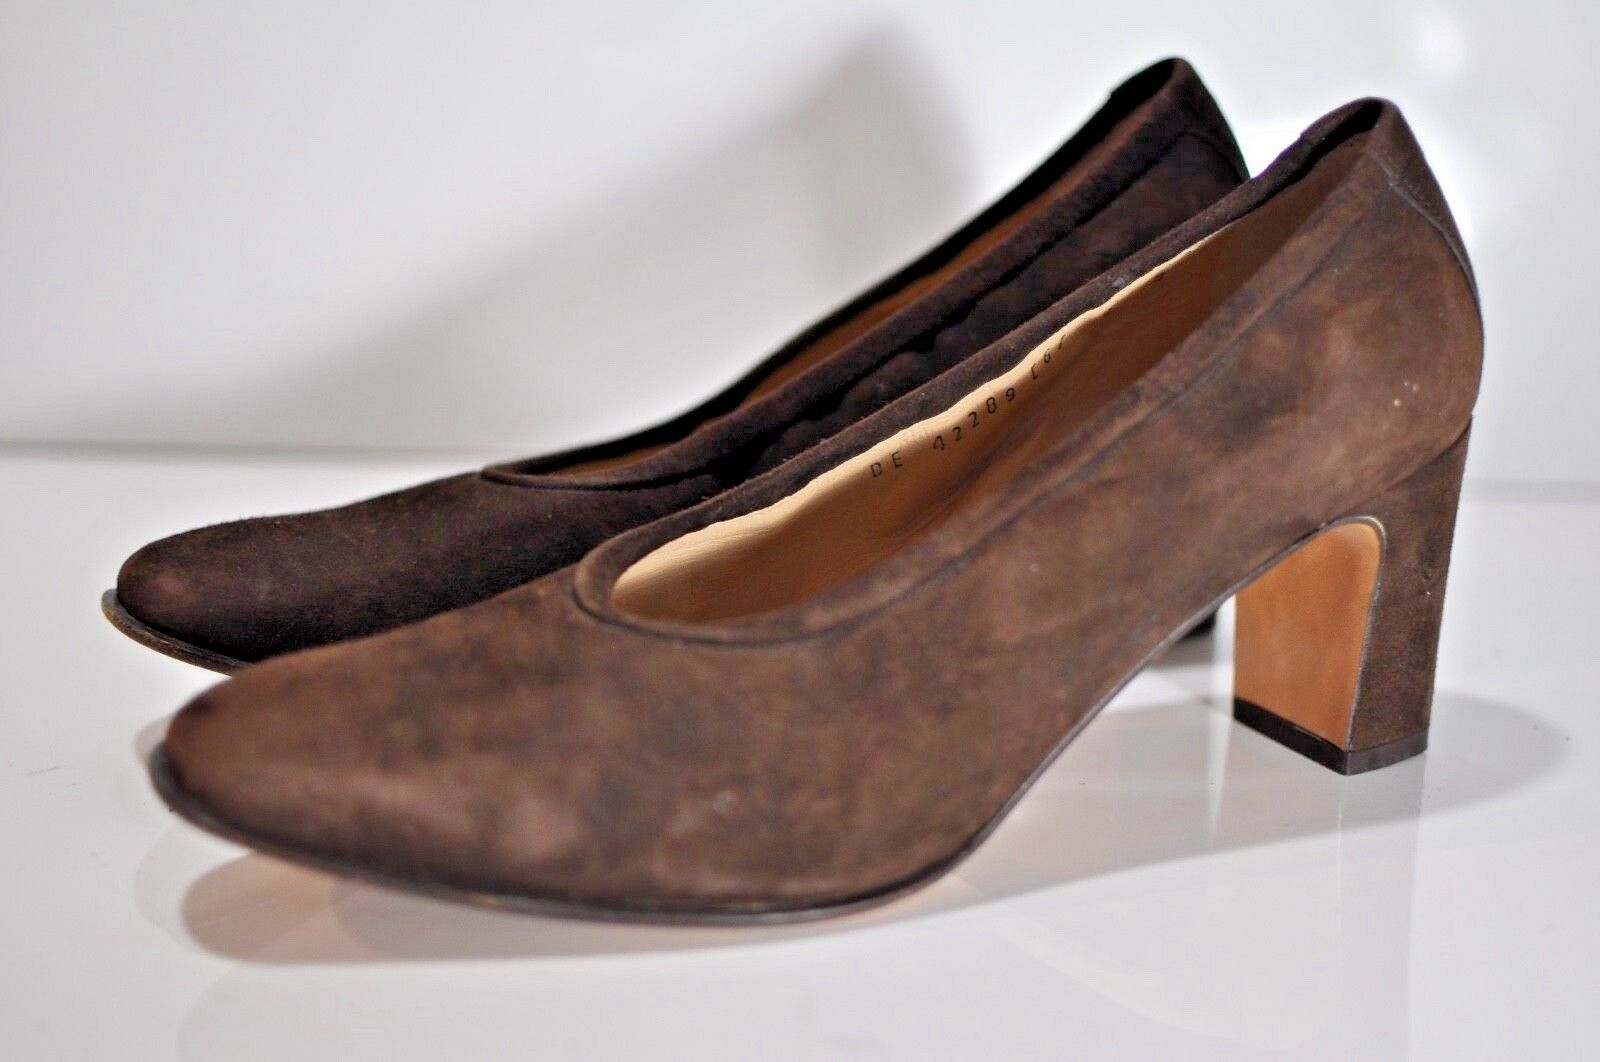 Salvatore Ferragamo Womens suede leather heels size 9 B made in